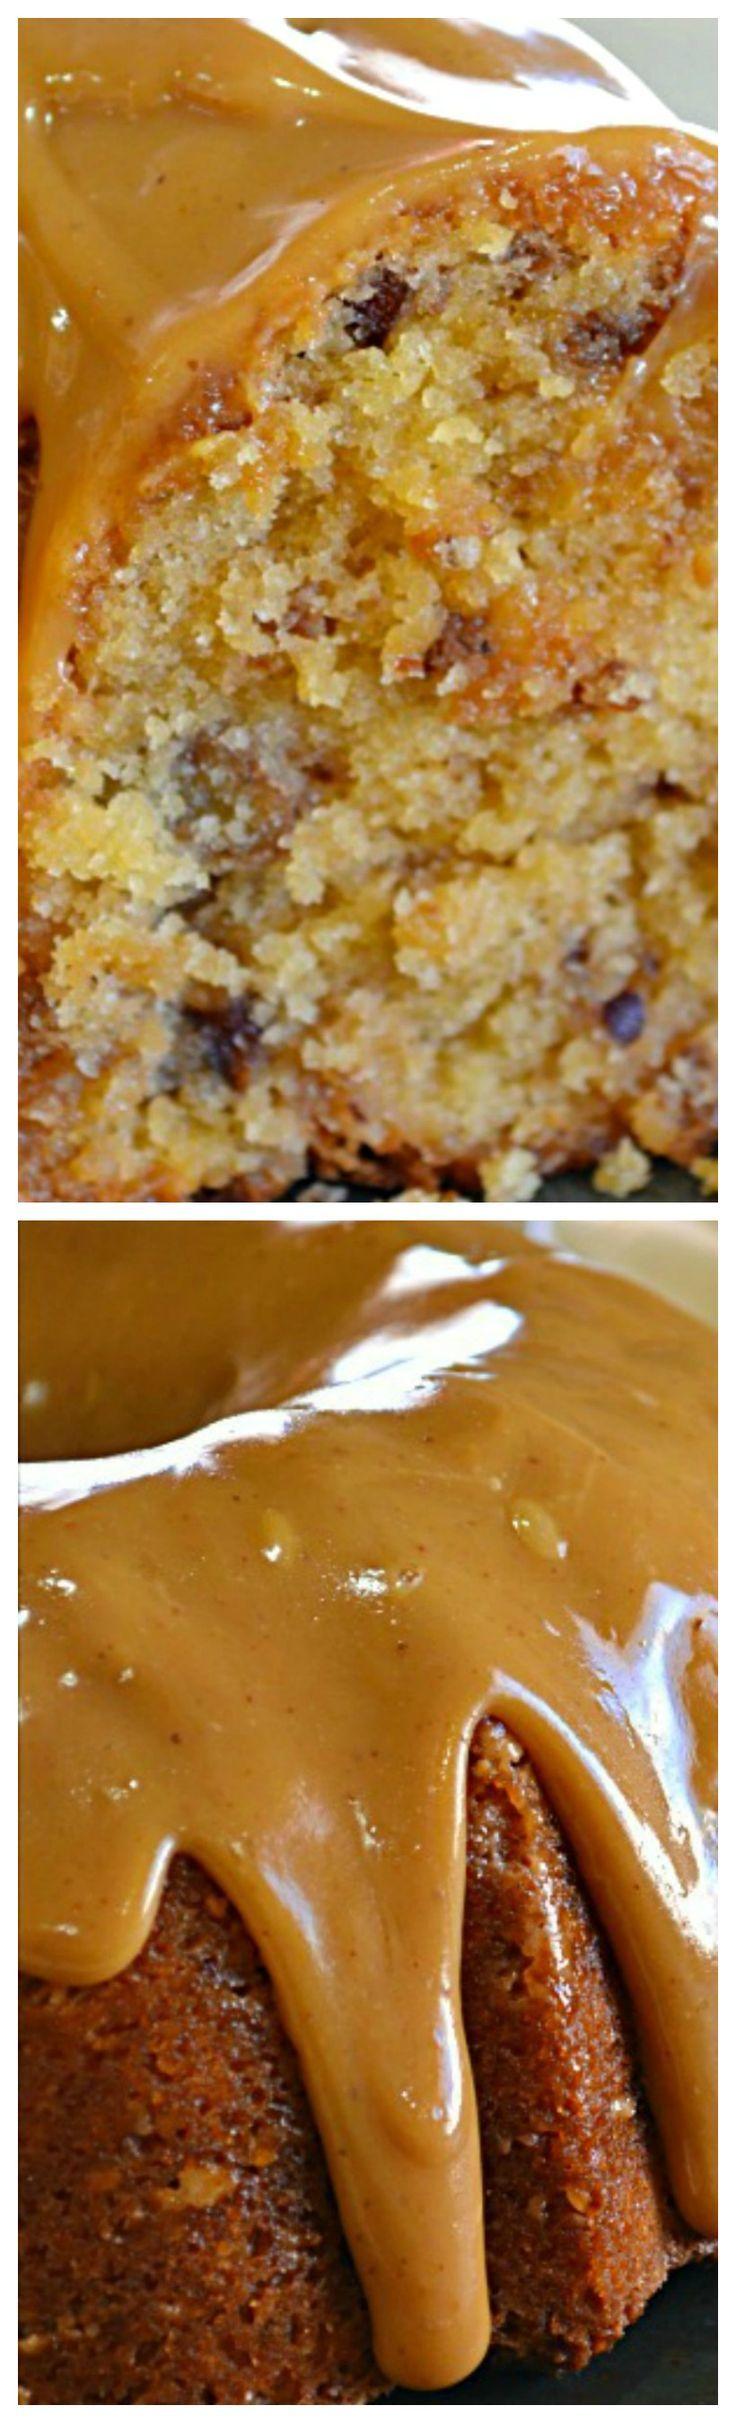 Brown Sugar Carmel Pound Cake ~ WONDERFUL caramel flavor and is VERY moist.